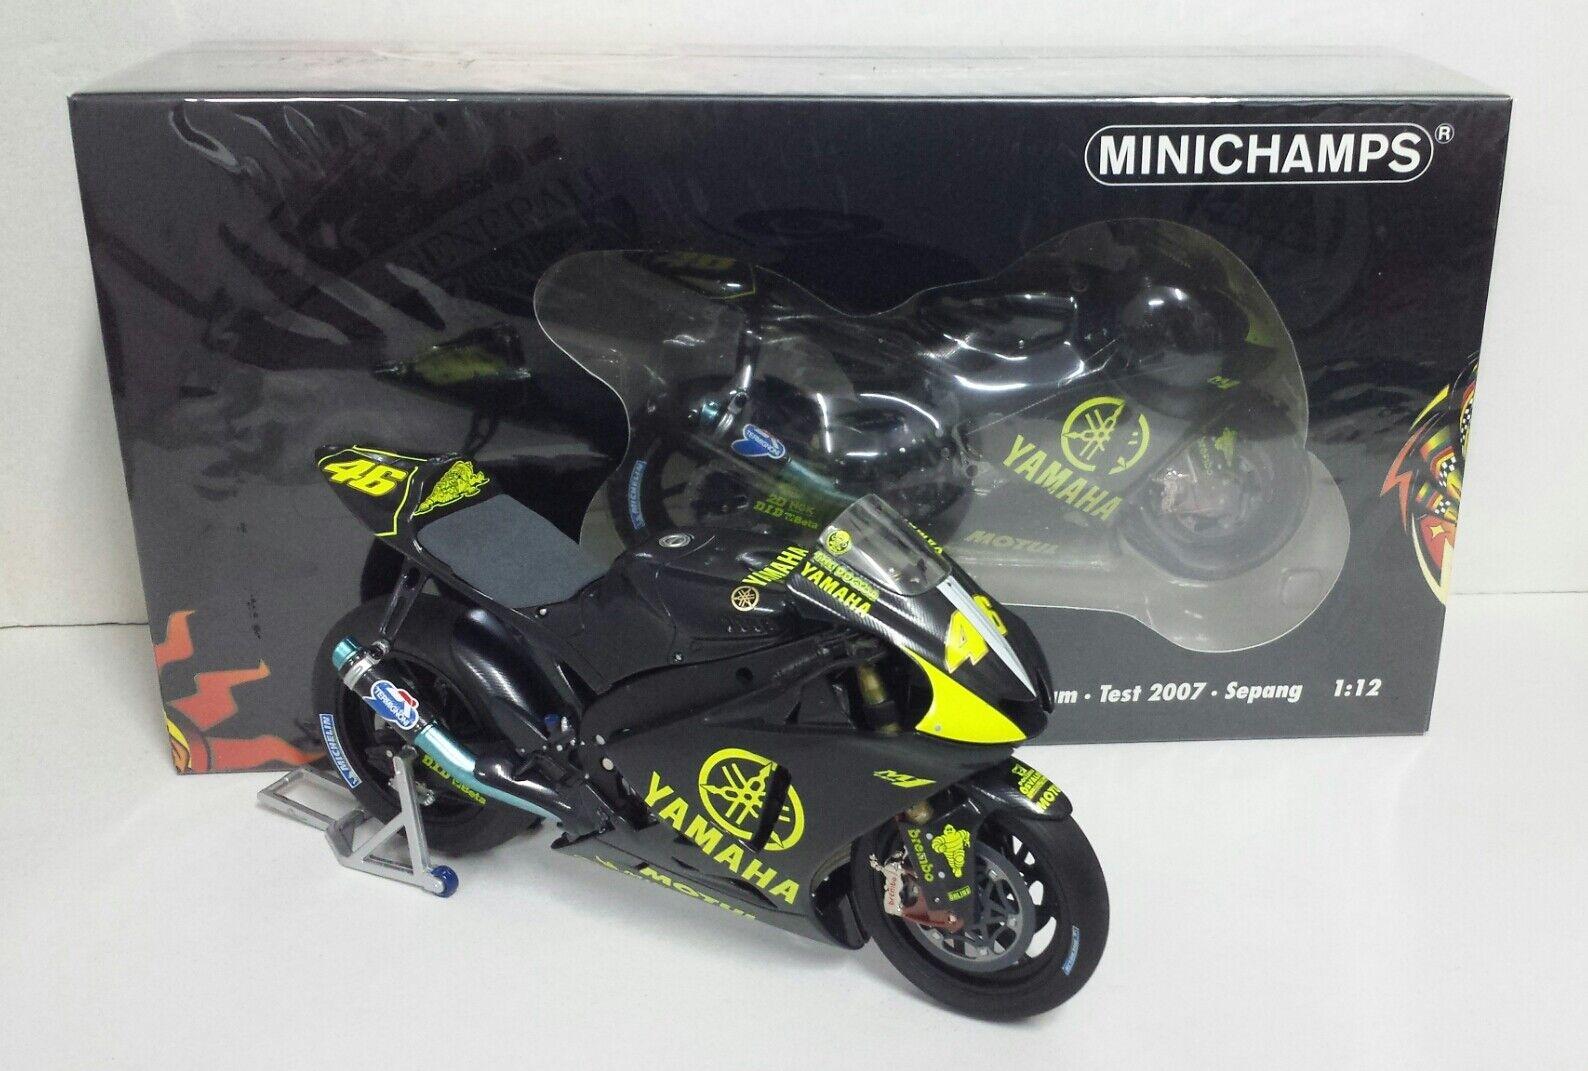 MINICHAMPS VALENTINO ROSSI 1 12 YAMAHA M1 MOTOGP TEST SEPANG 2007 L.E.1007 NEW